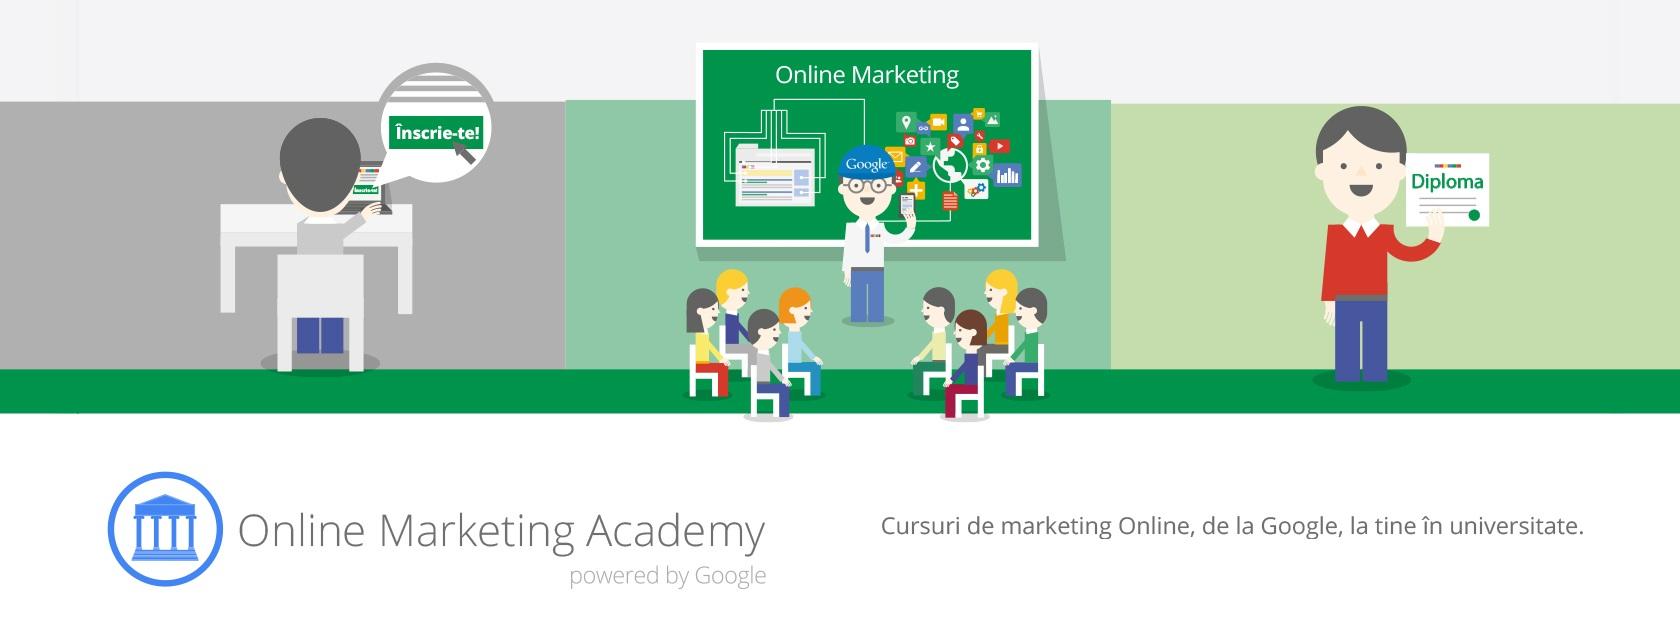 Conversion & Online Marketing Academy